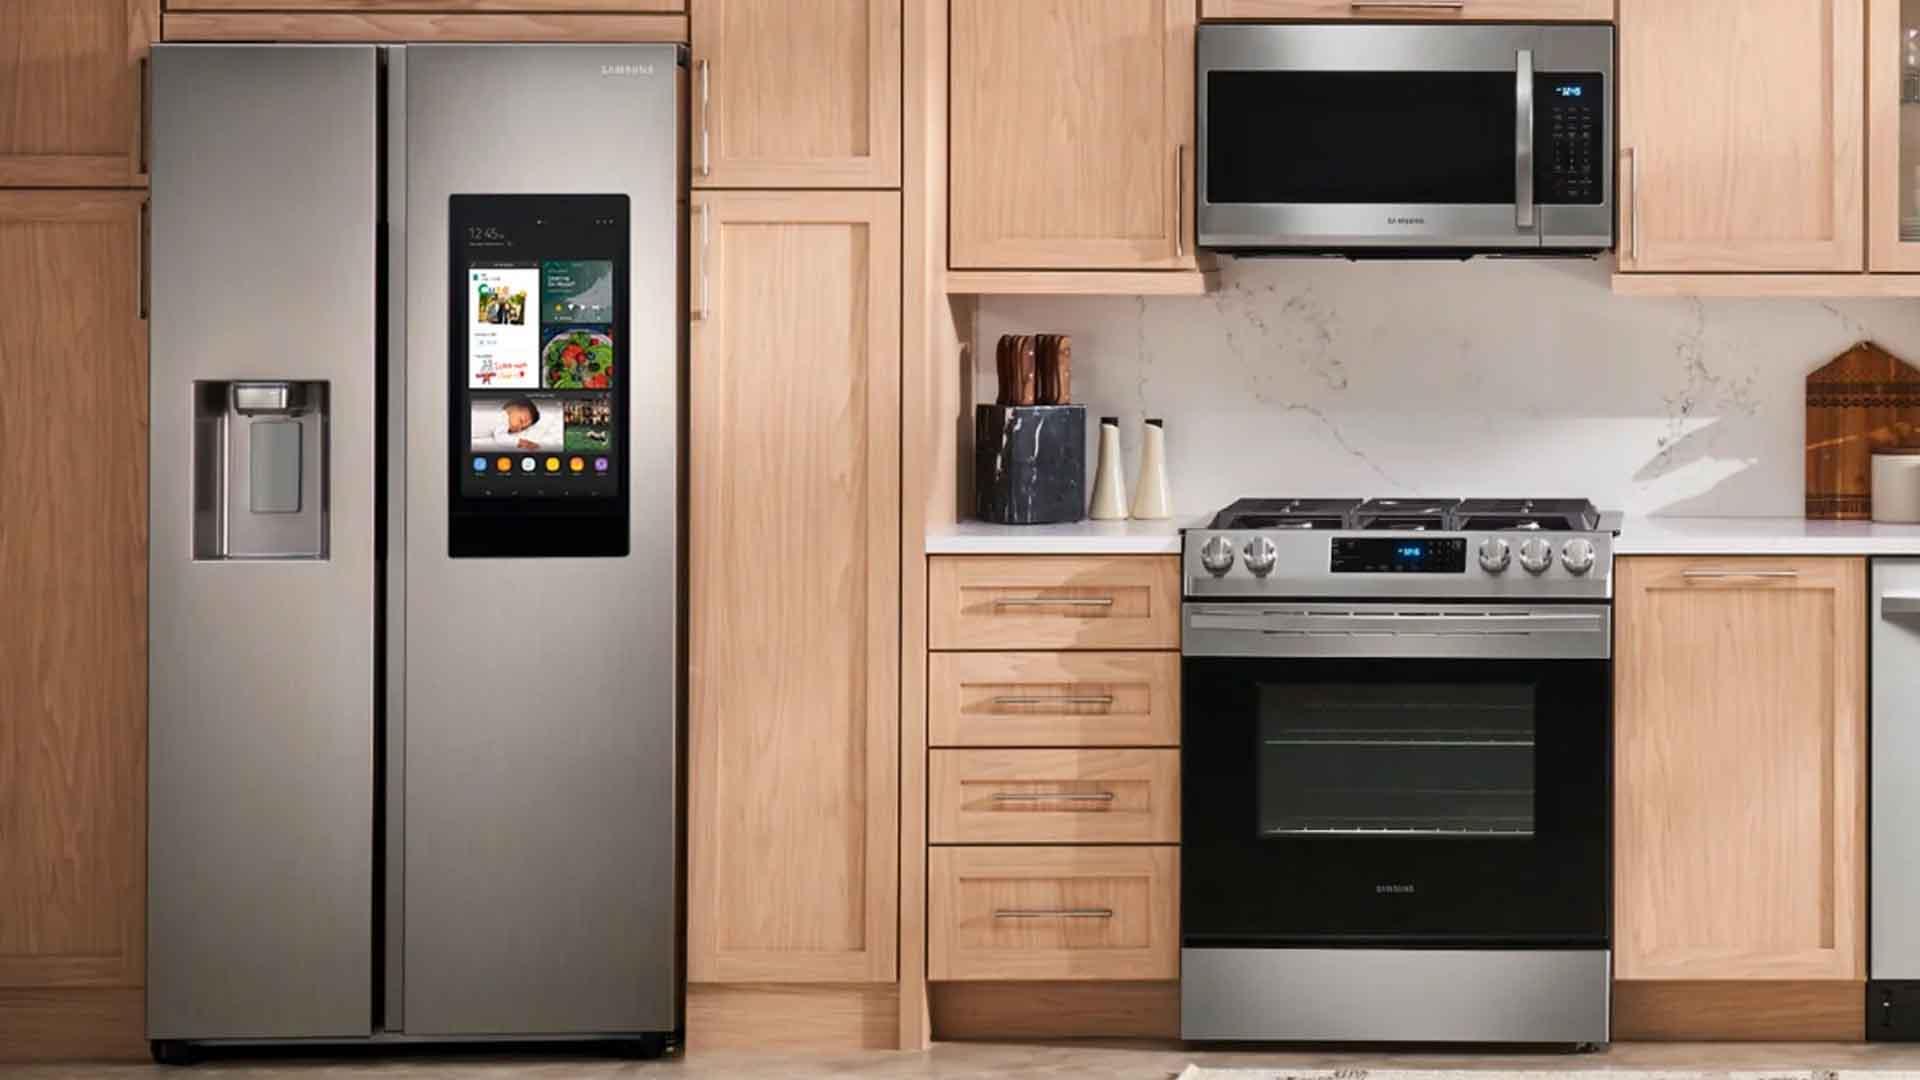 Samsung Side by Side Refrigerator Repair   Samsung Appliance Repairs